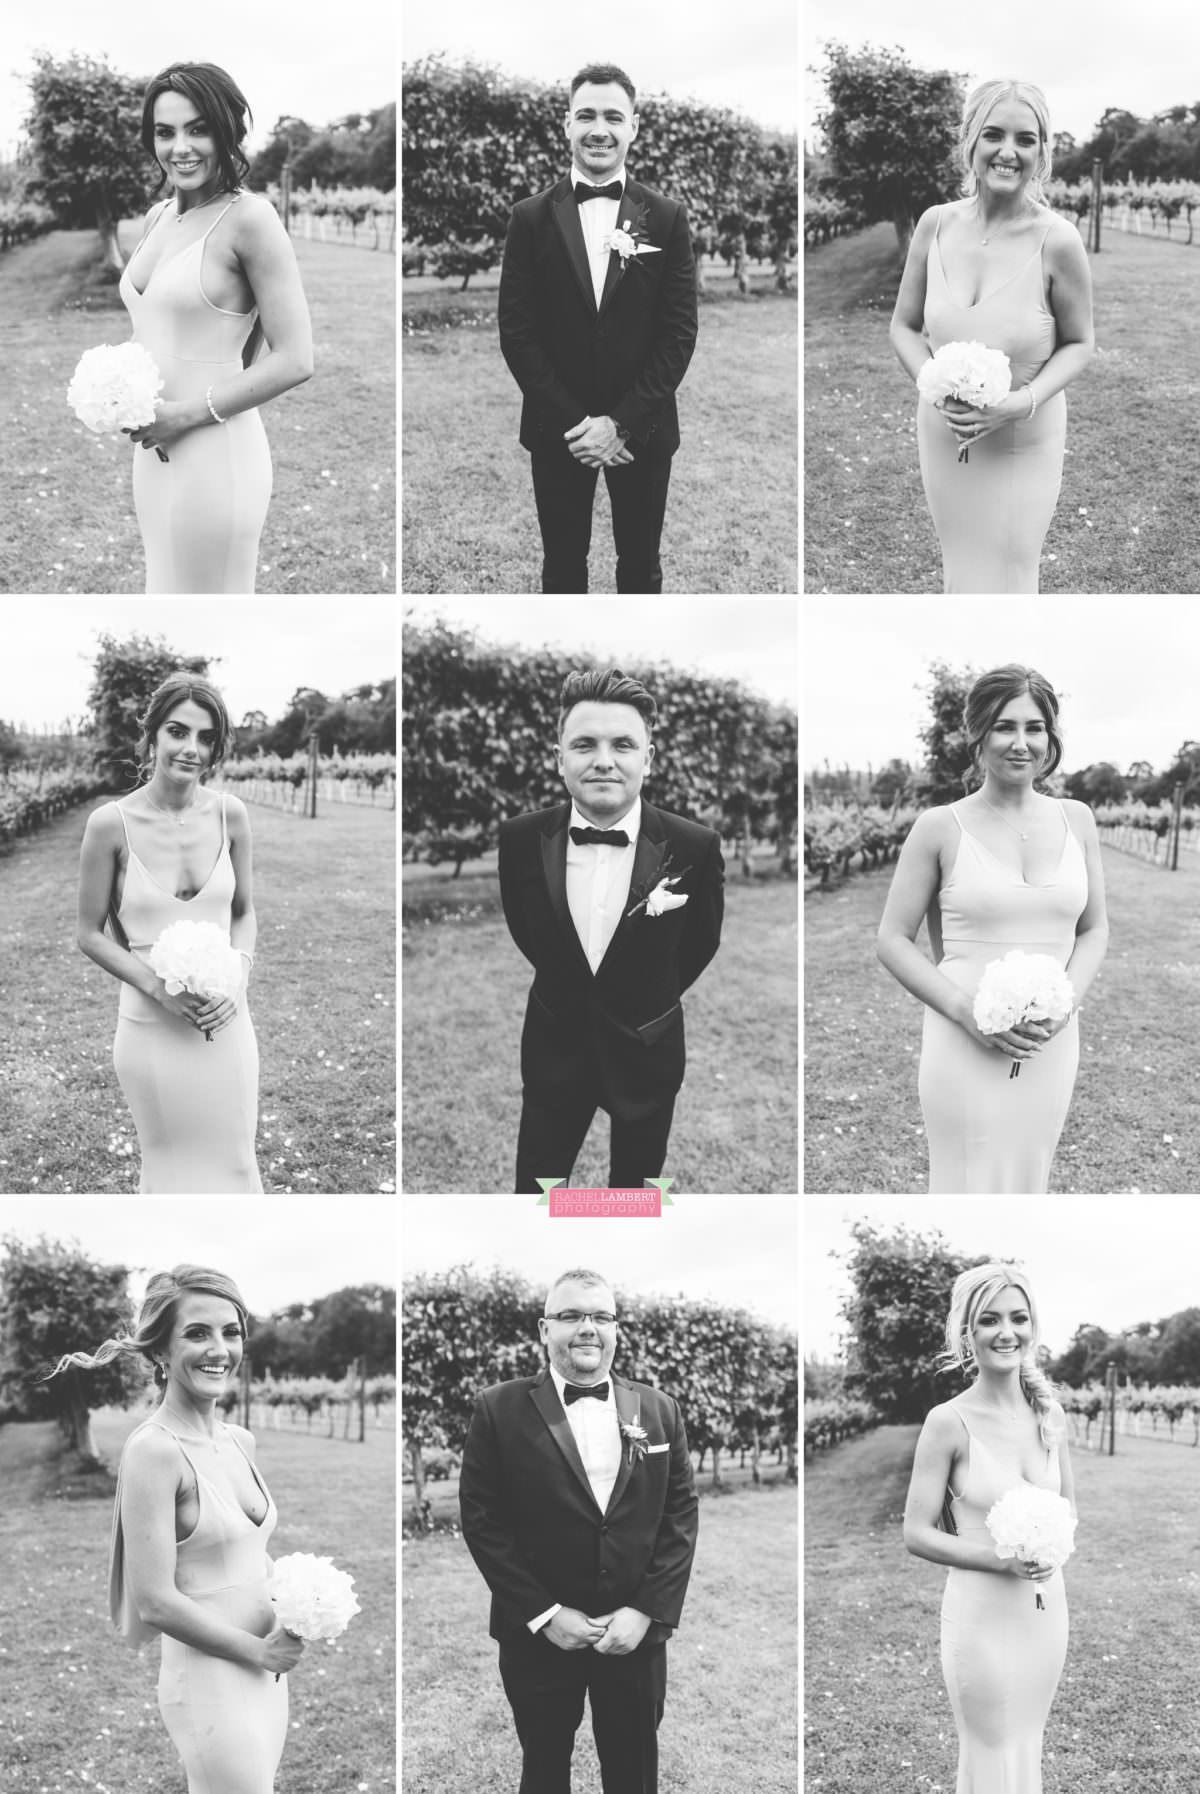 Cardiff Wedding Photographer Llanerch Vineyard rachel lambert photography bridal party